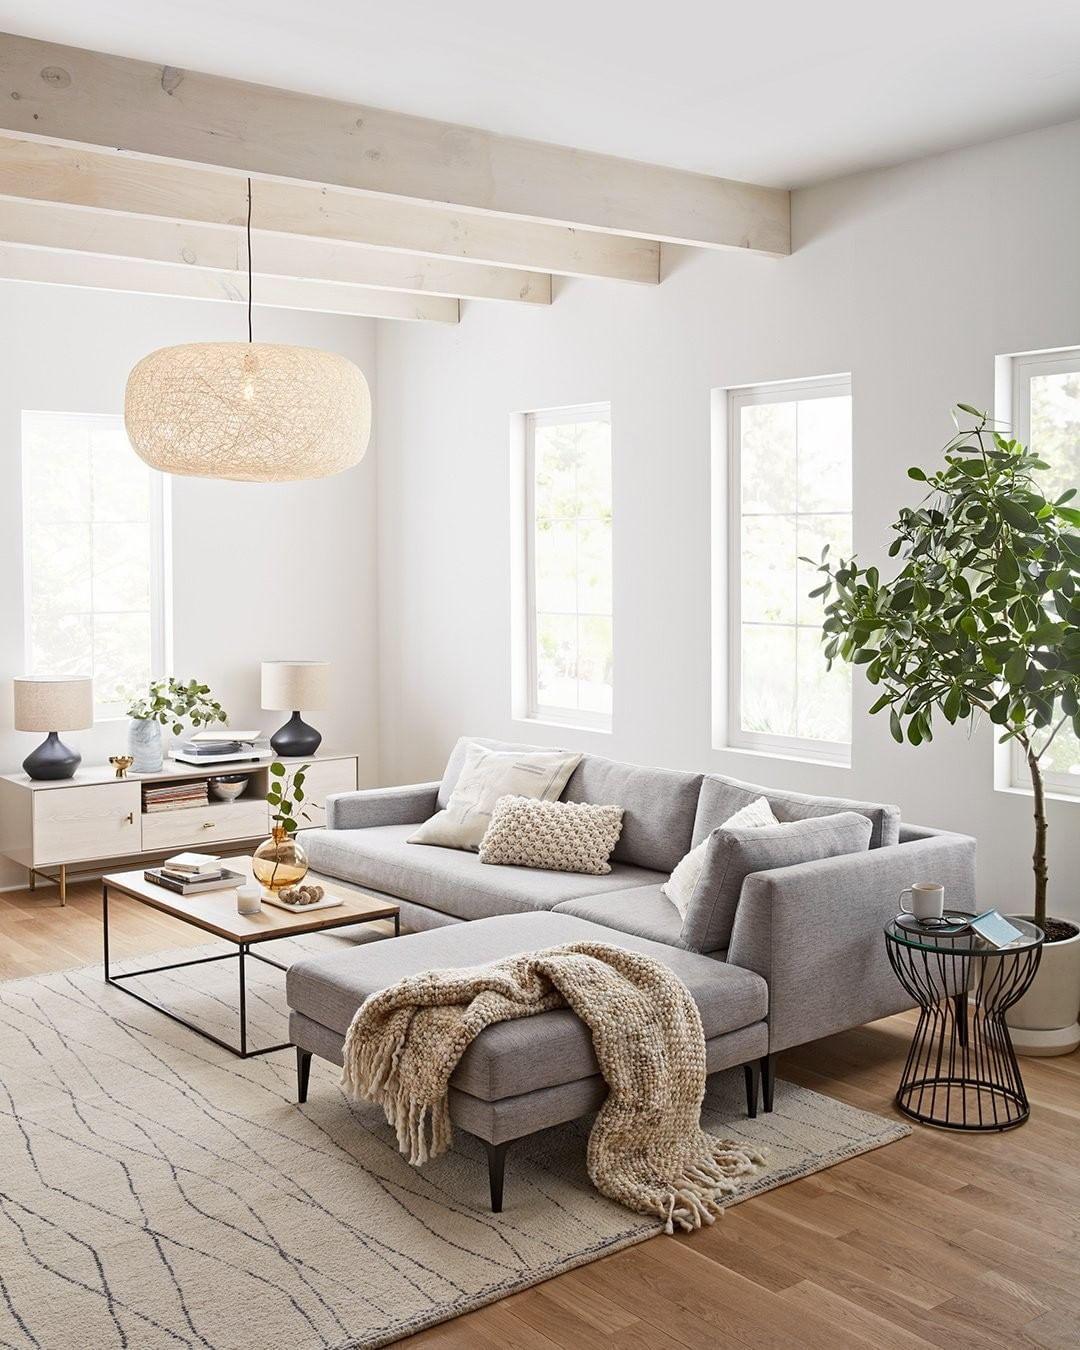 10+ Most Popular West Elm Living Room Ideas